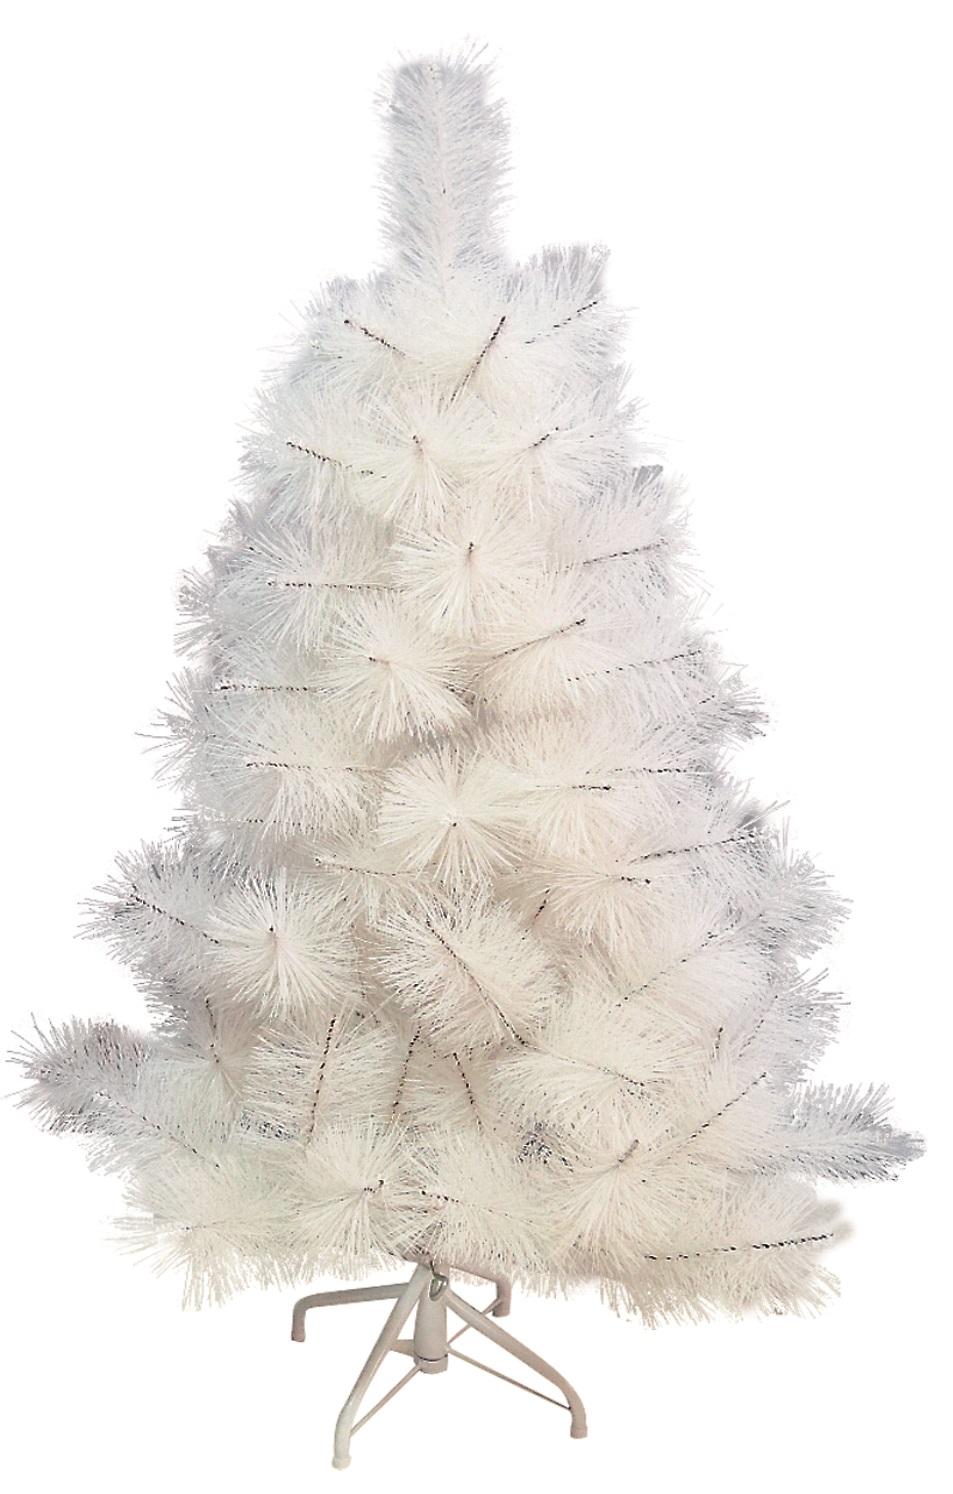 X射線【X020380】2尺聖誕松針樹(白)(不含飾品、燈飾),聖誕樹/聖誕佈置/聖誕空樹/聖誕造景